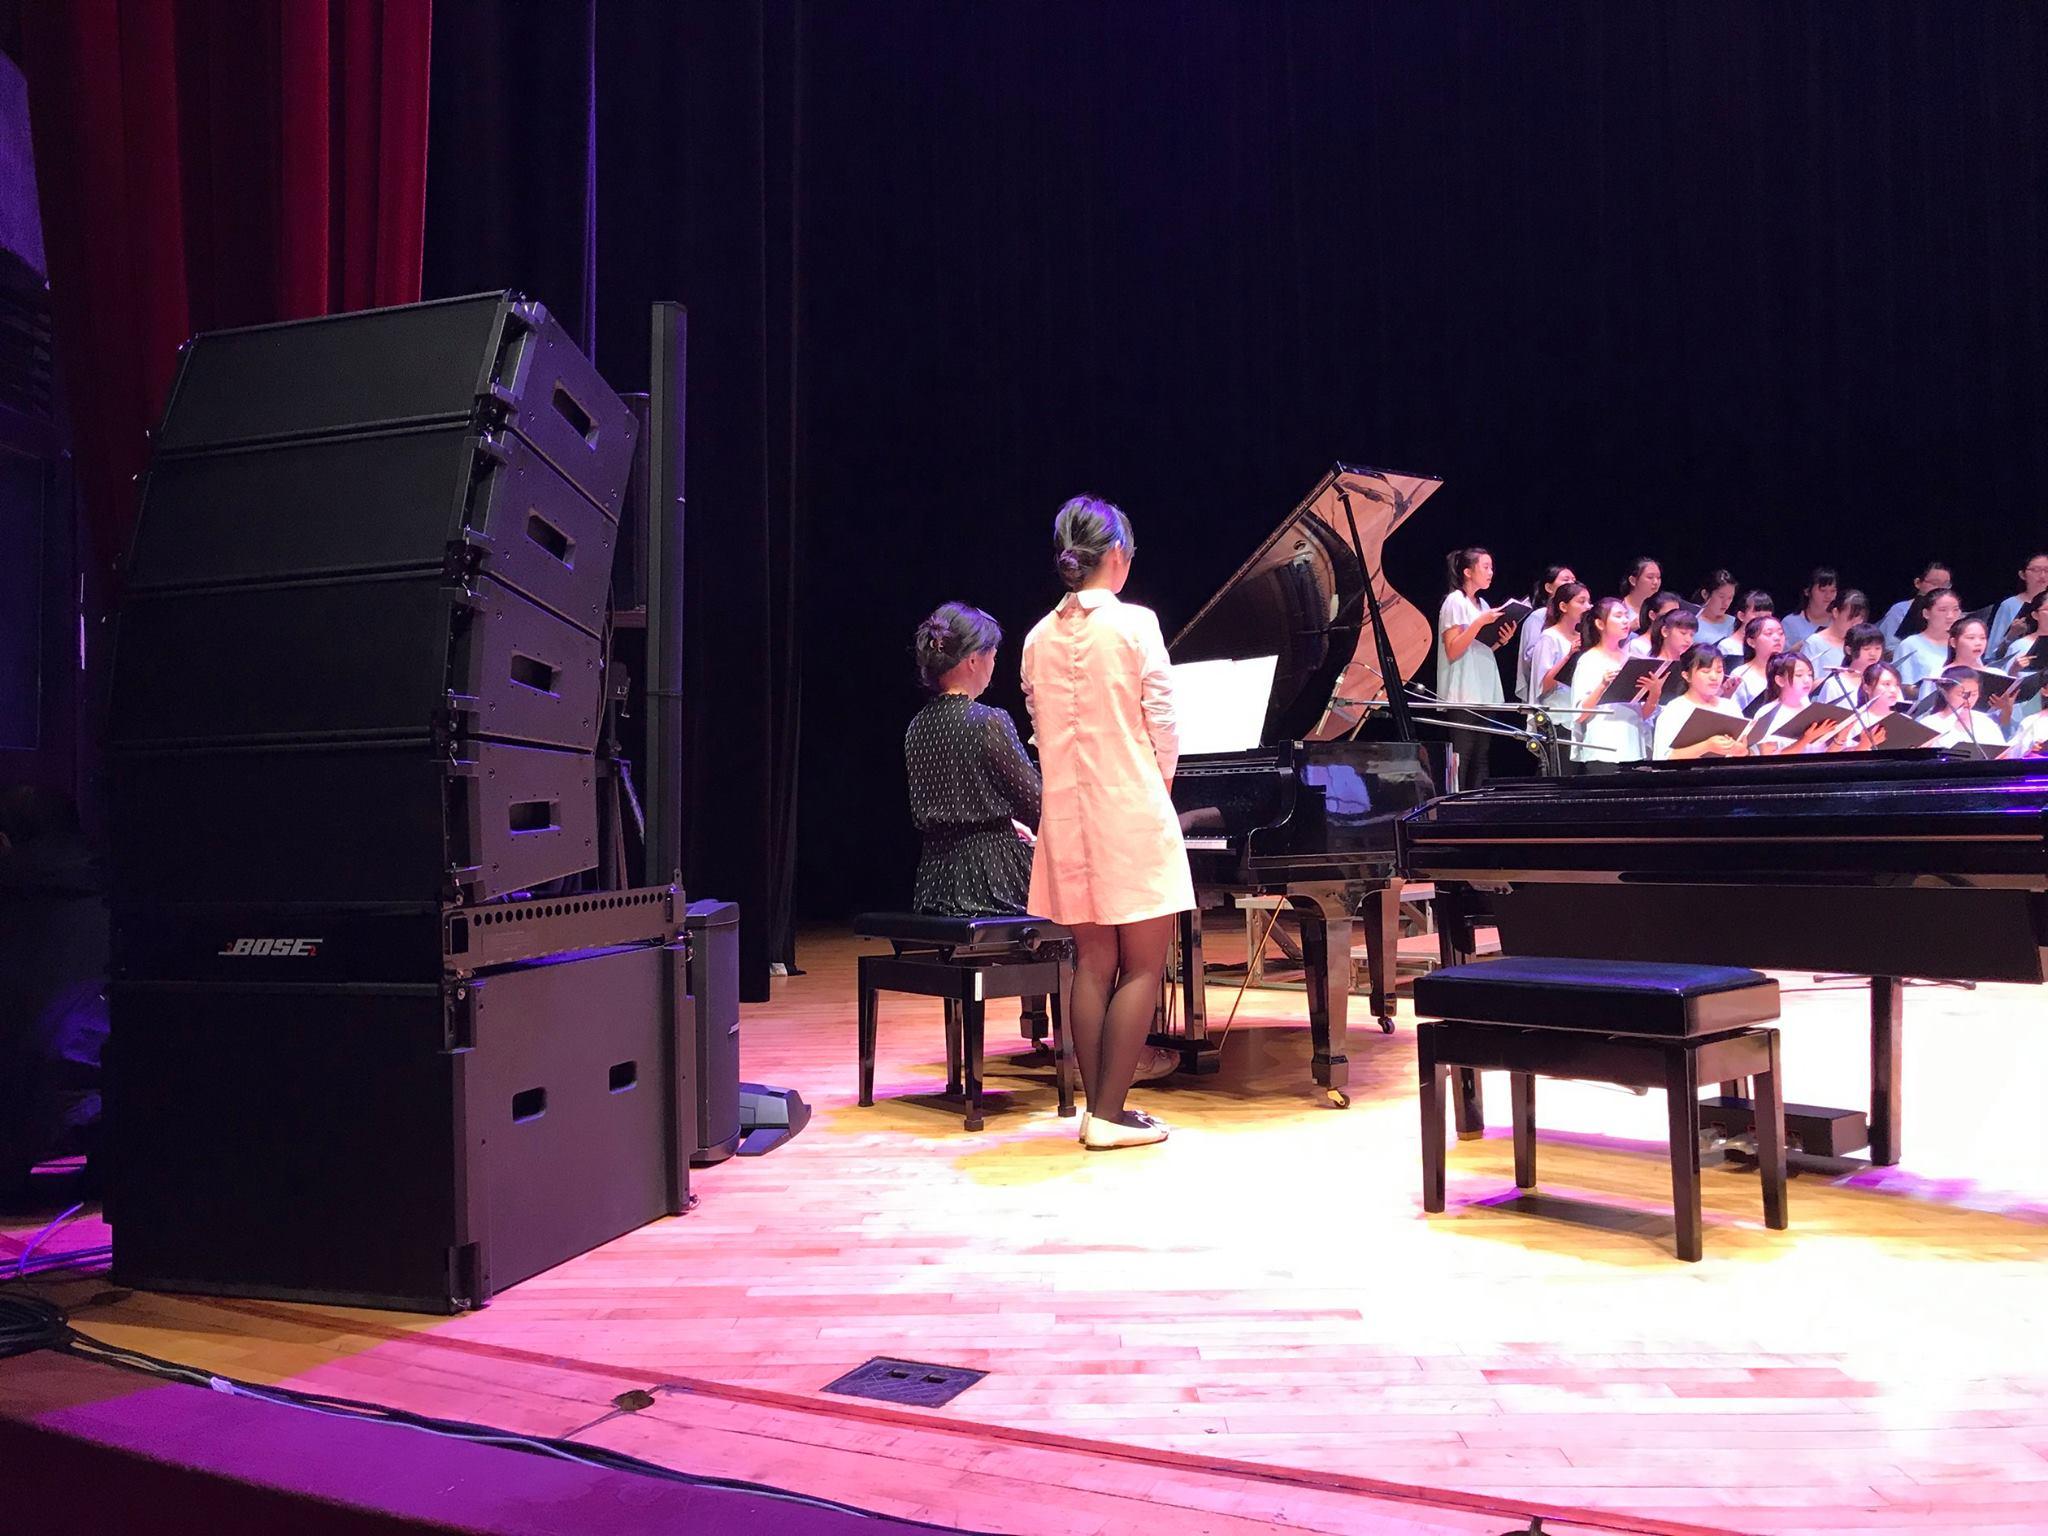 Bose ShowMatch 陣列揚聲器系統在台北國父紀念館2500人的大會堂中再一次獲得完美演出!